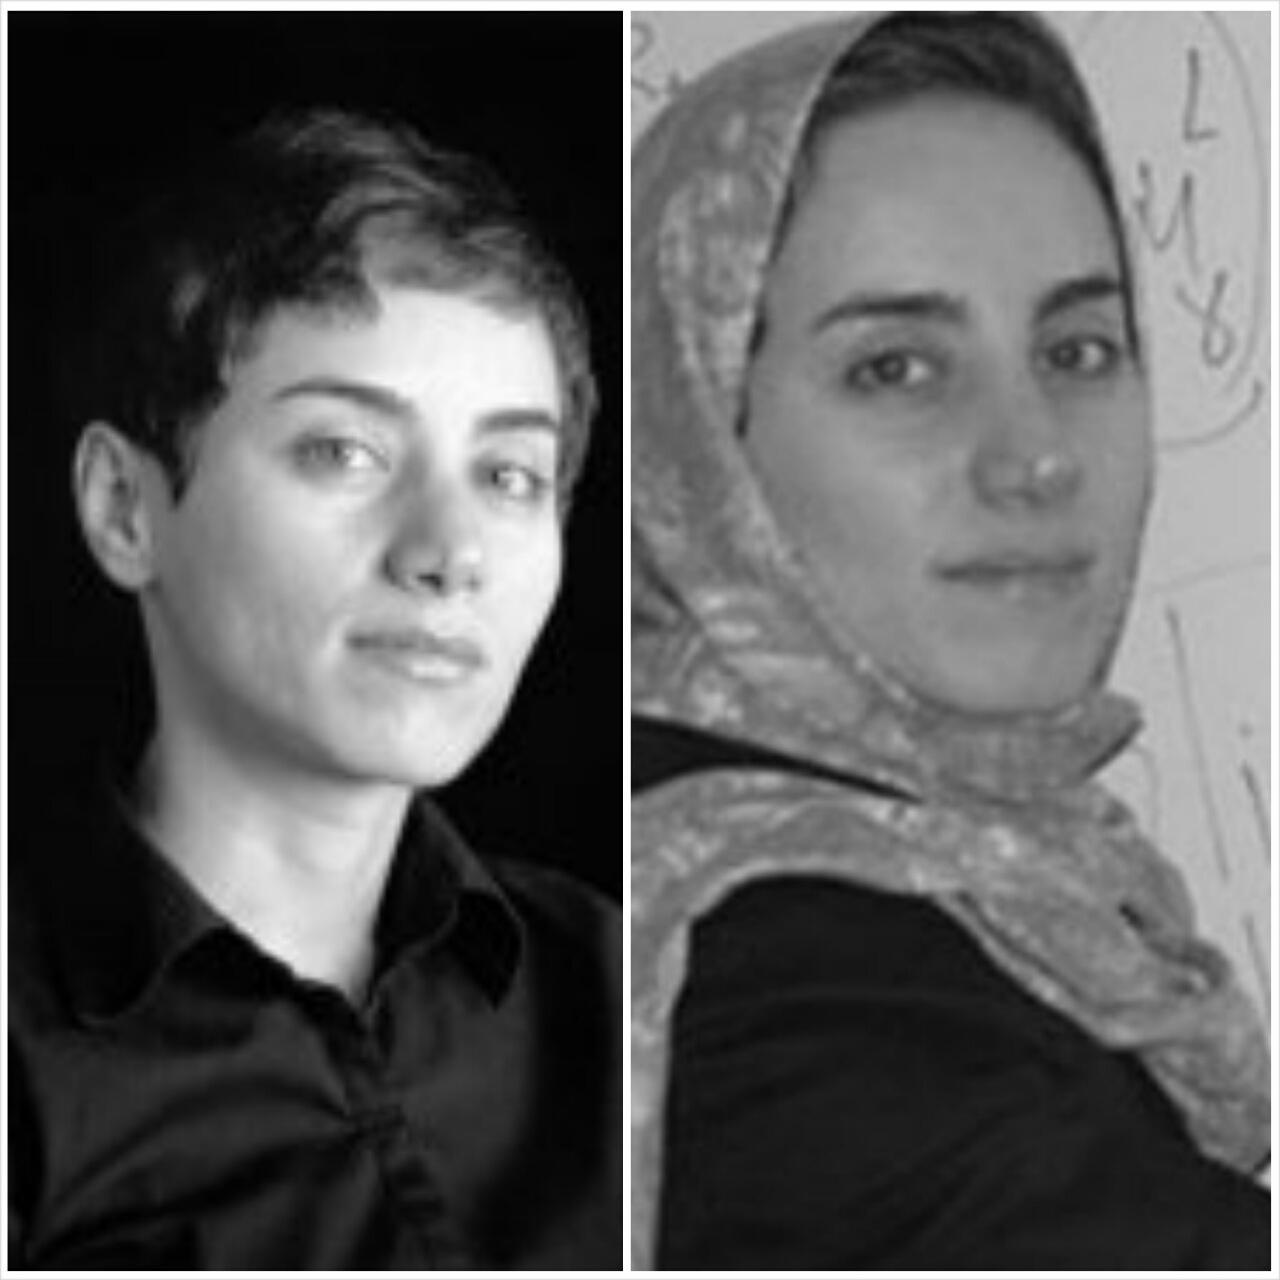 Rouhani's Photo of Bare-Headed Mirzakhani Shocks World, Iran's Treatment of Women Doesn't